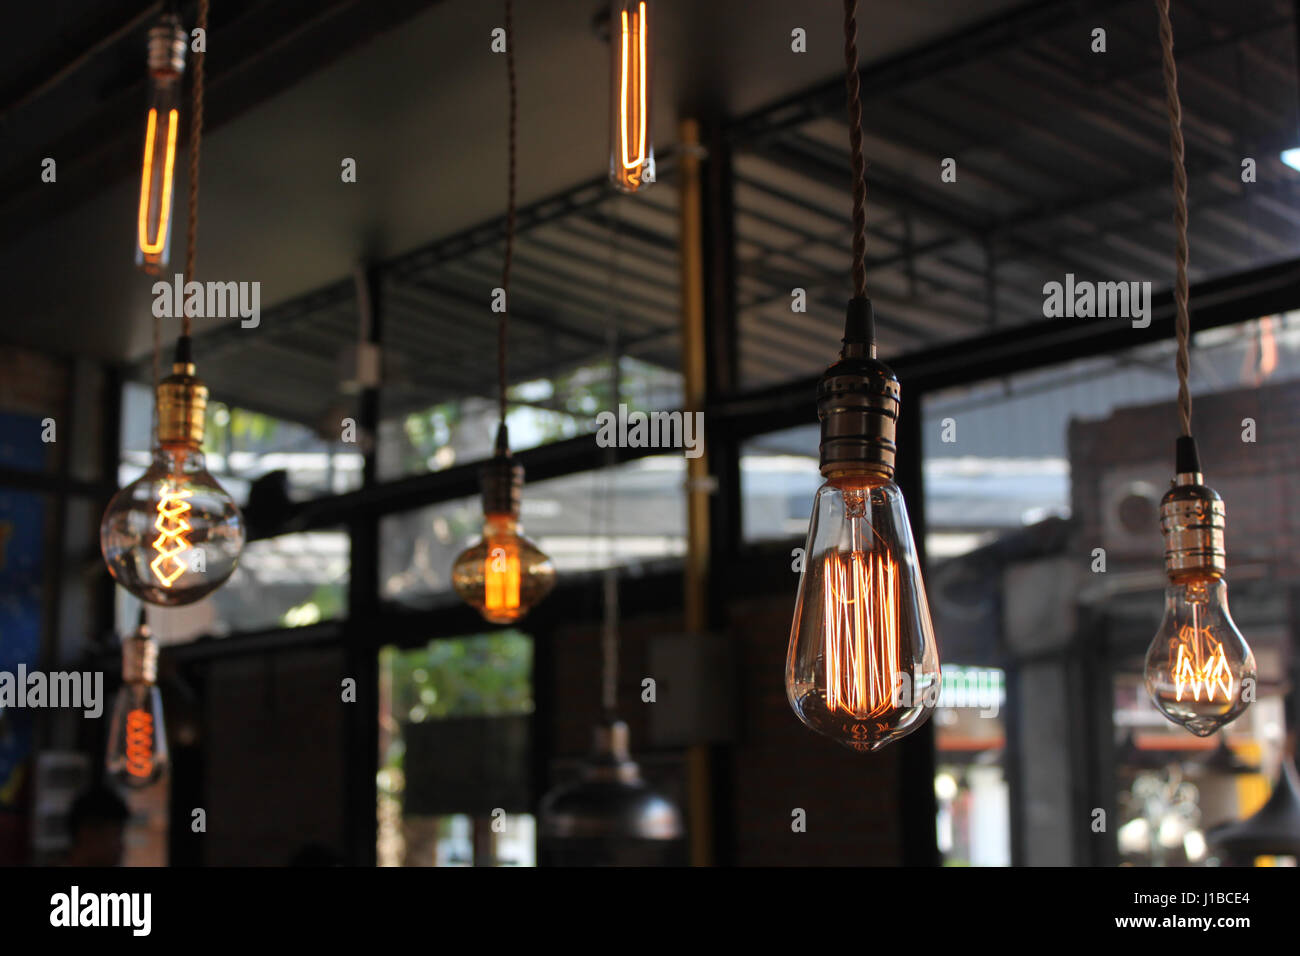 Set of glowing light bulbs hang on ceiling - Stock Image